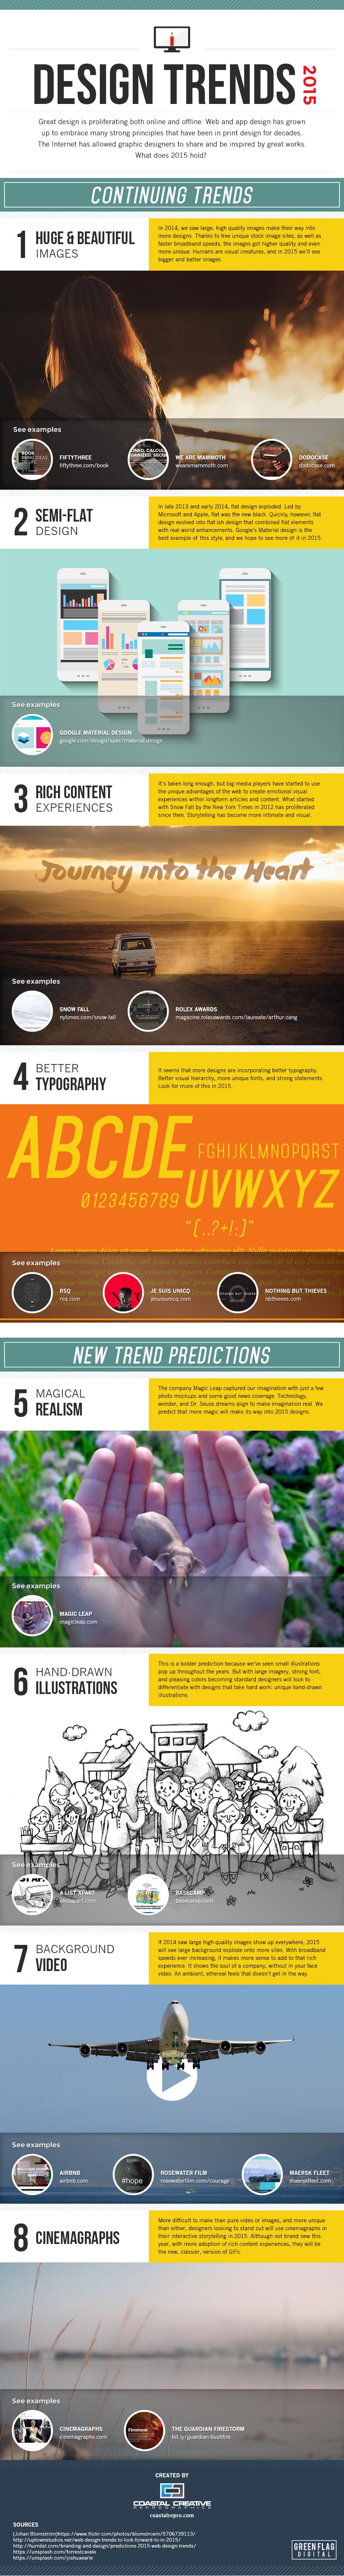 Design trends 2015 Infographic